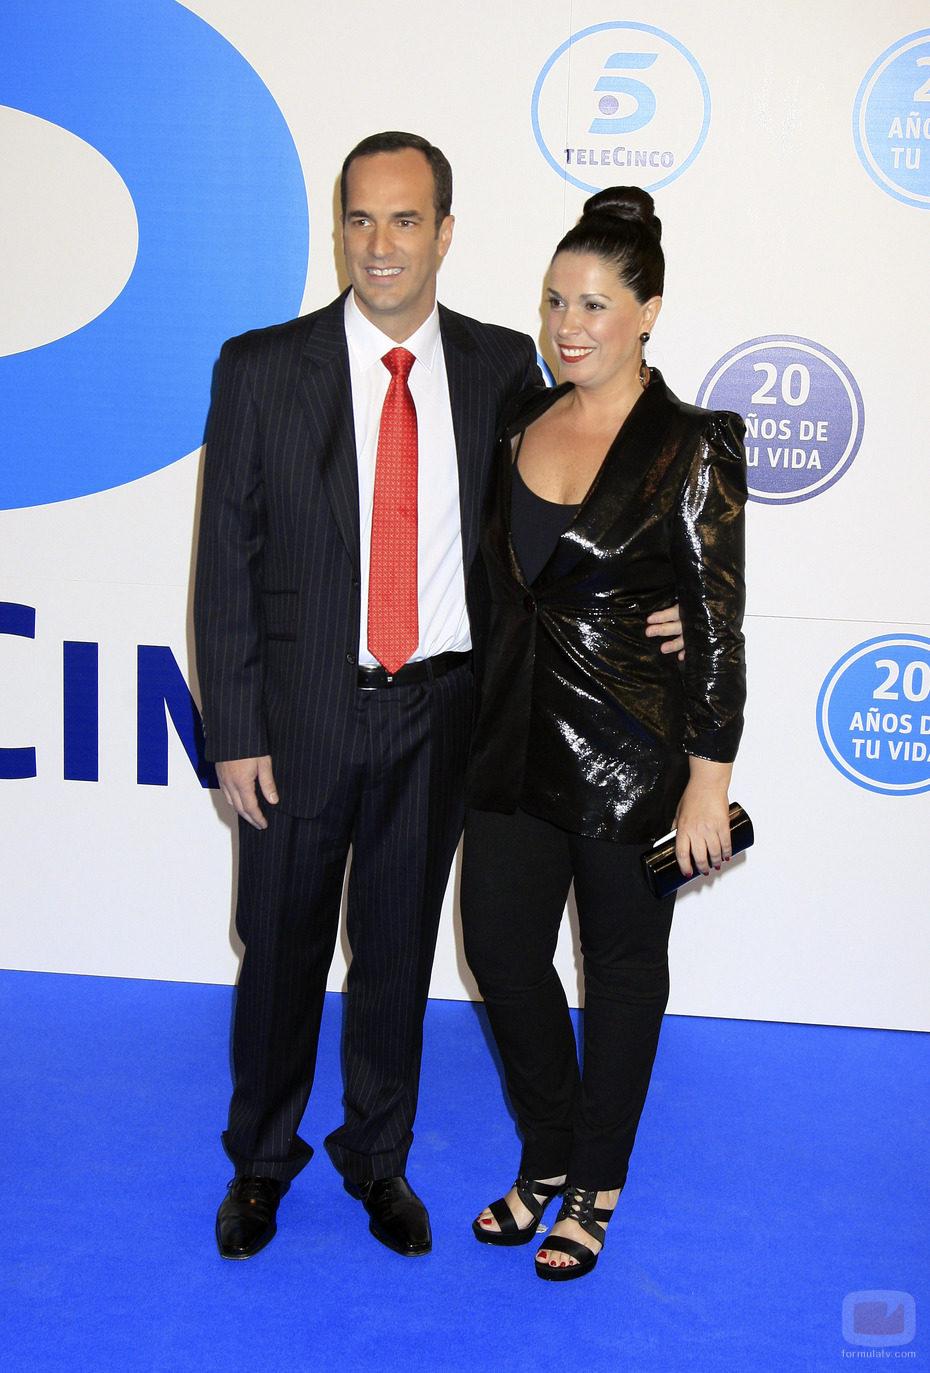 Santi Acosta y Sandra Fernández